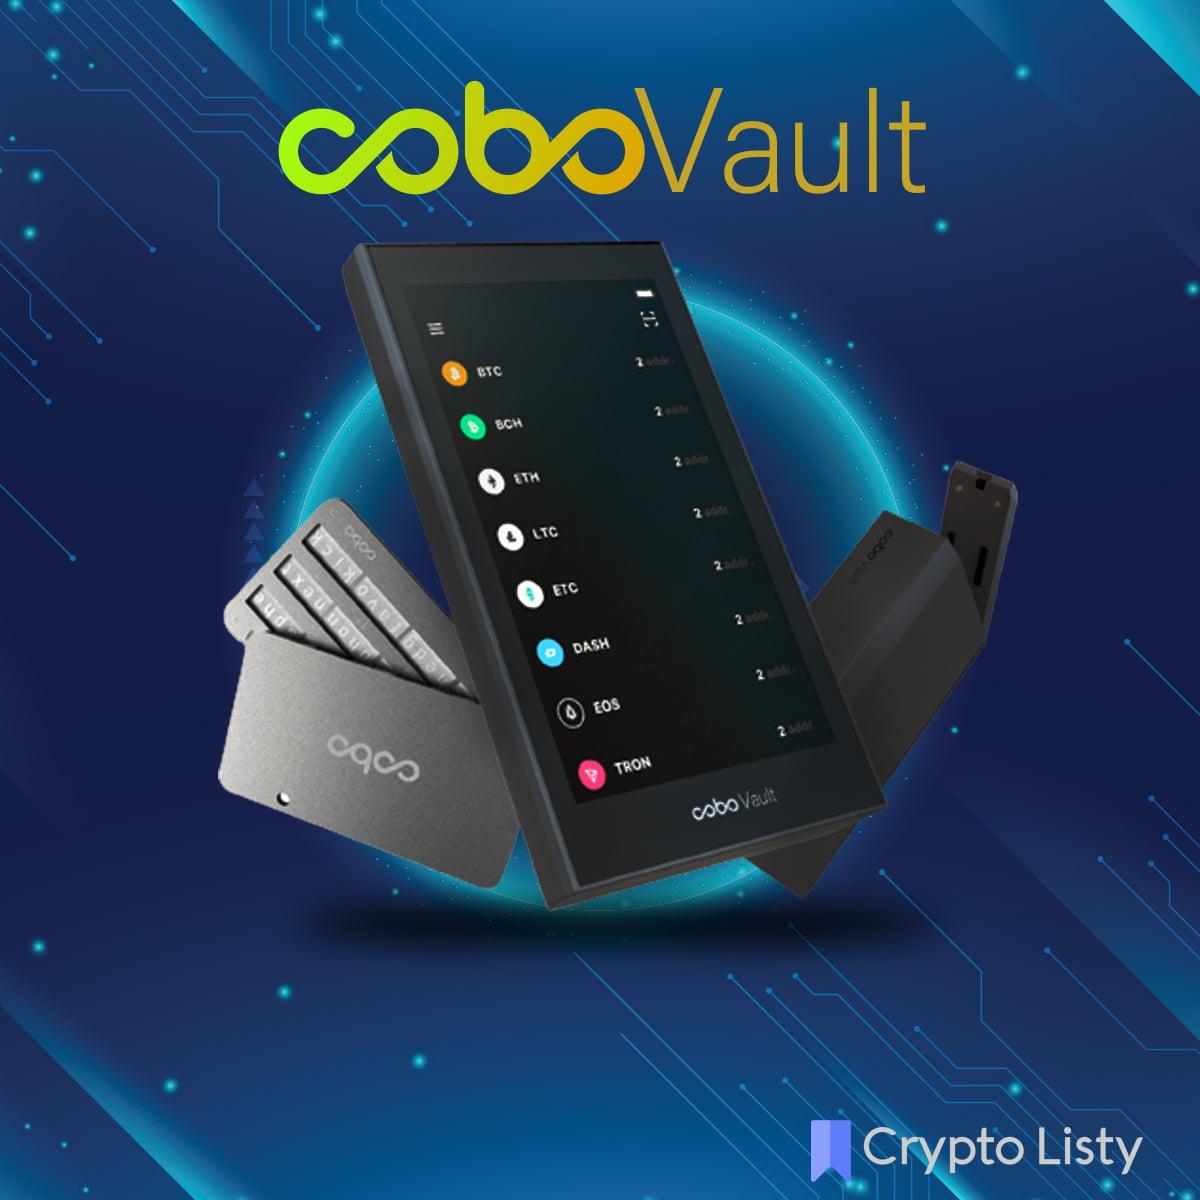 CoboVault device